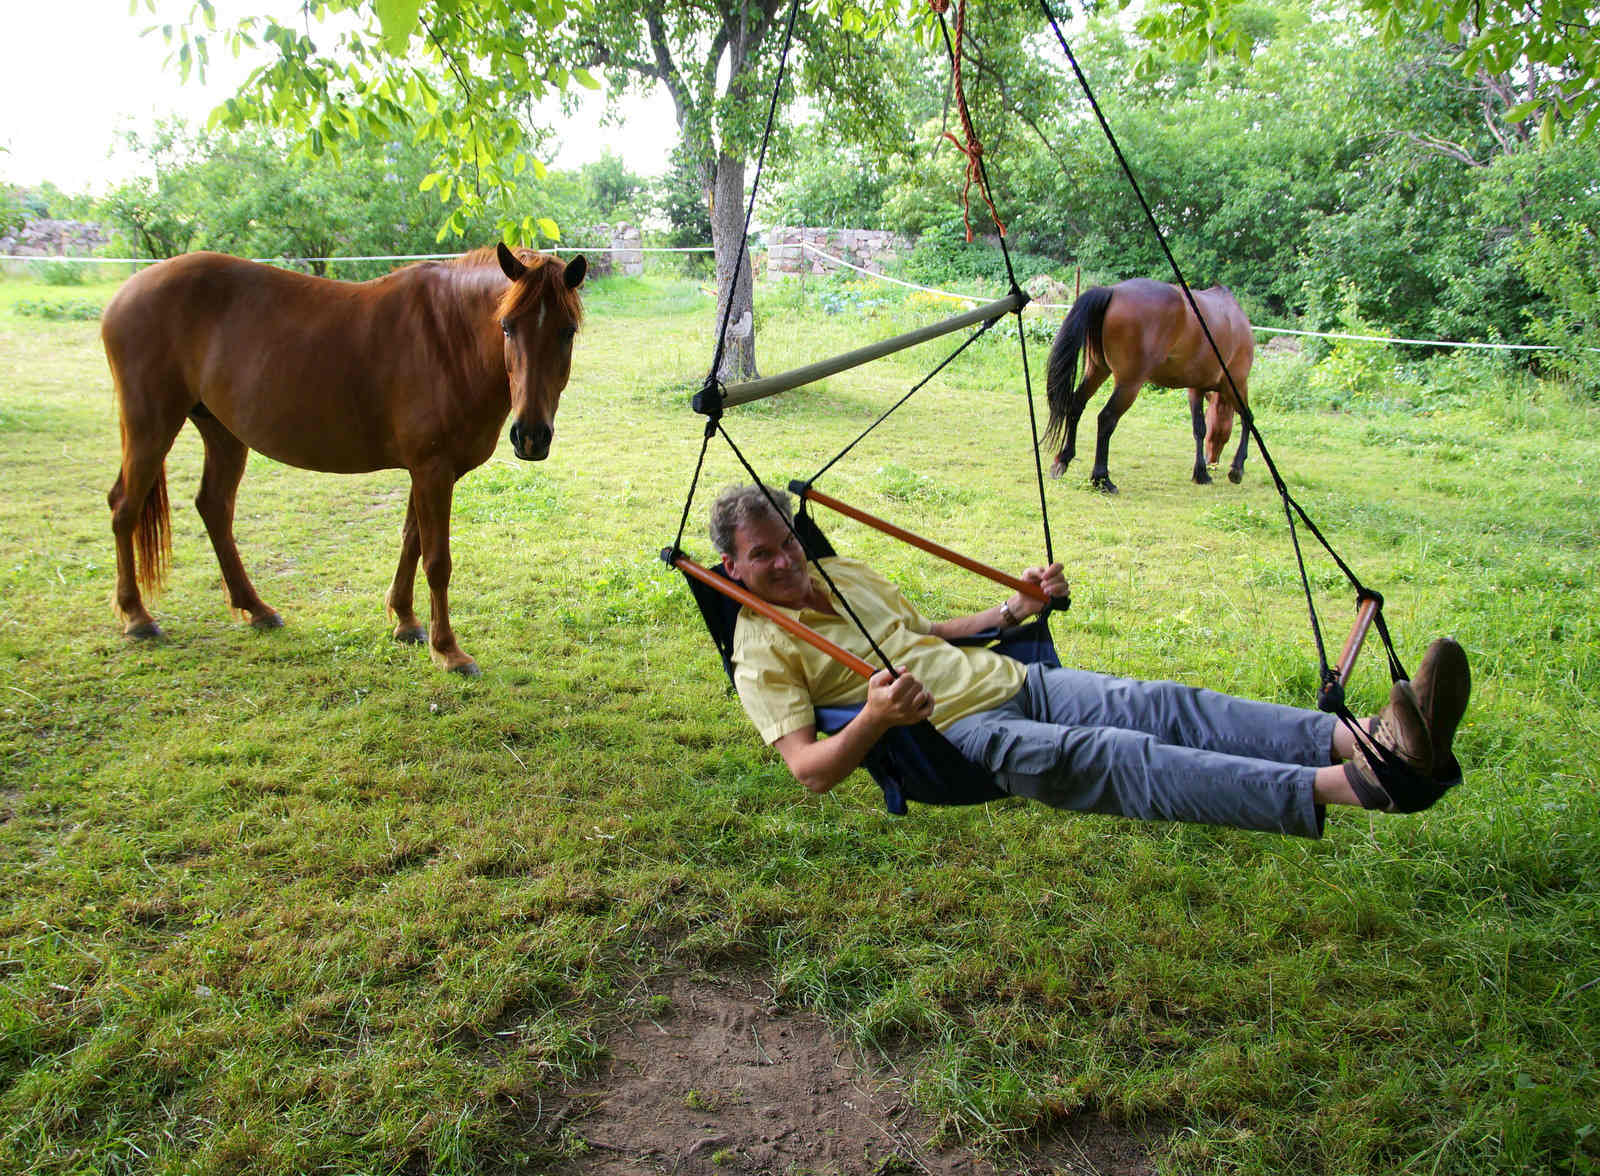 Pferde, Entspannung, Wiese